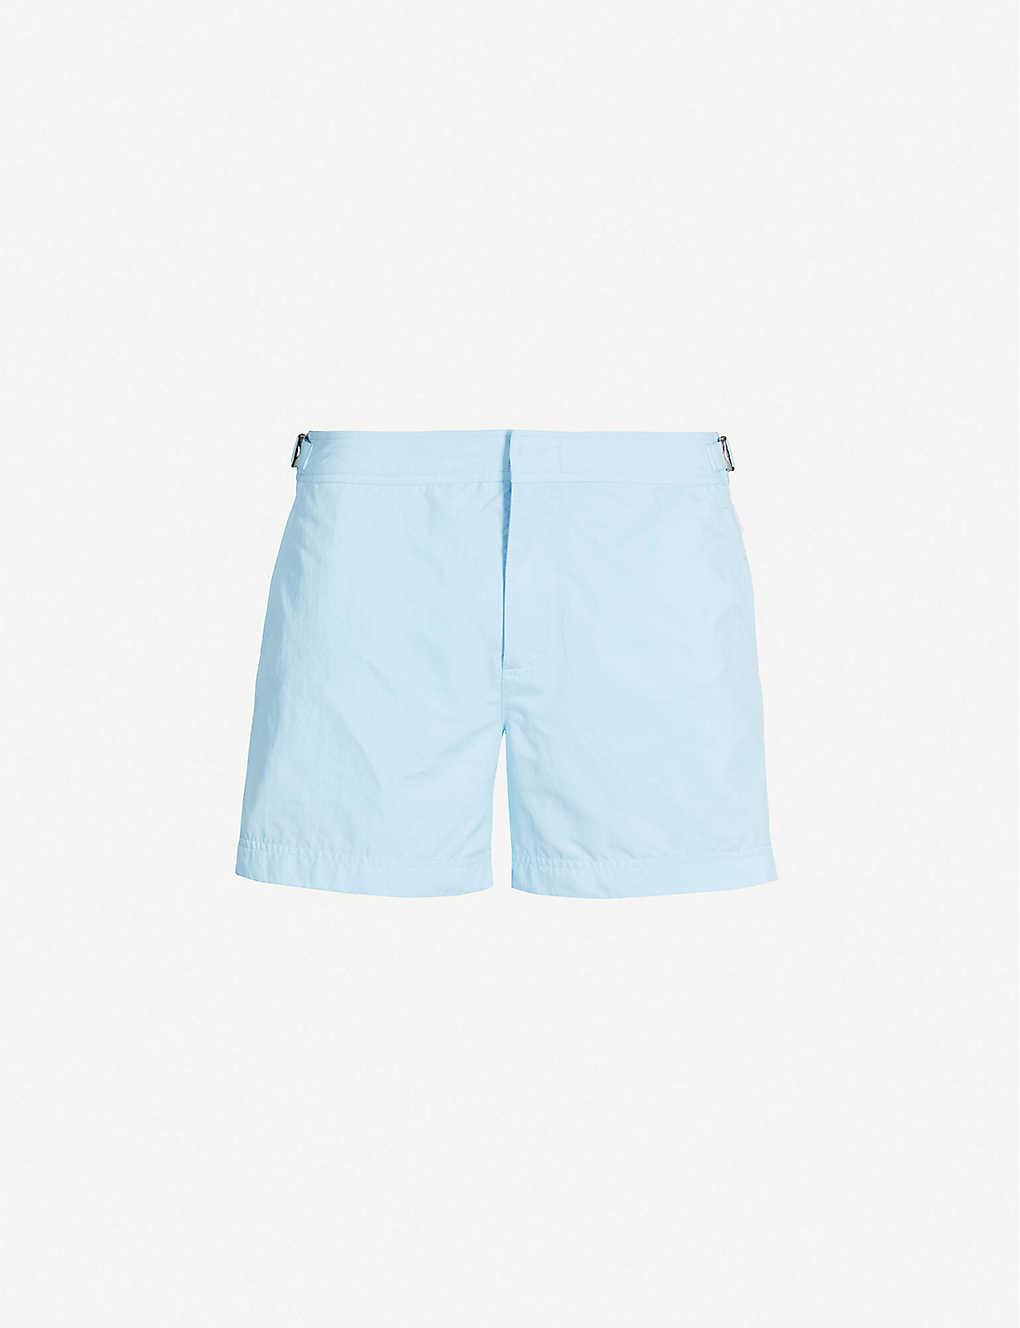 3bb0ec487a6b7 ORLEBAR BROWN - x James Bond Setter Skyfall swim shorts | Selfridges.com